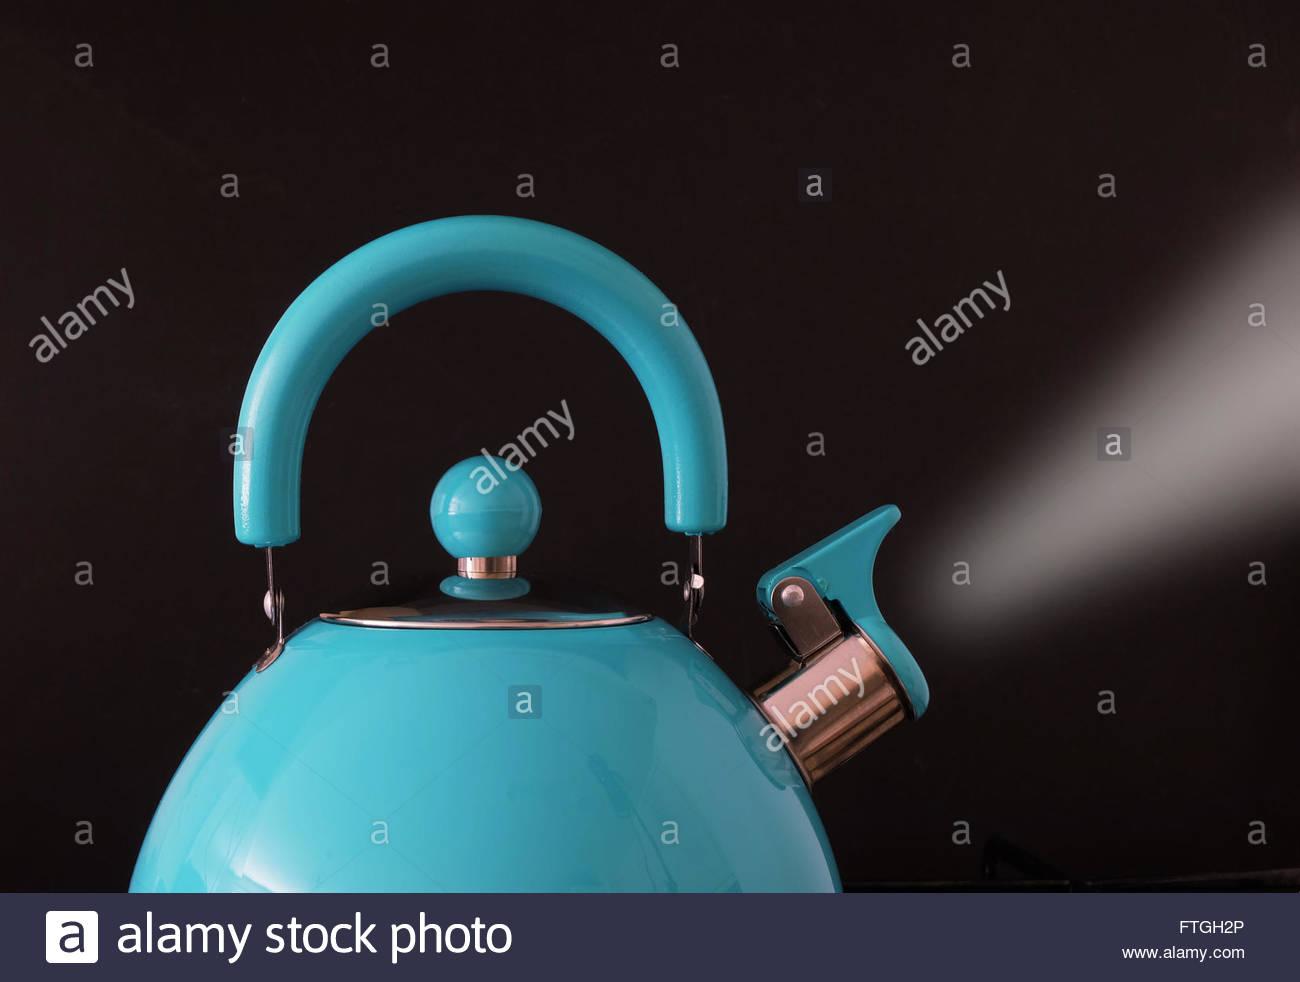 Steaming Kettle Stockfotos & Steaming Kettle Bilder - Alamy